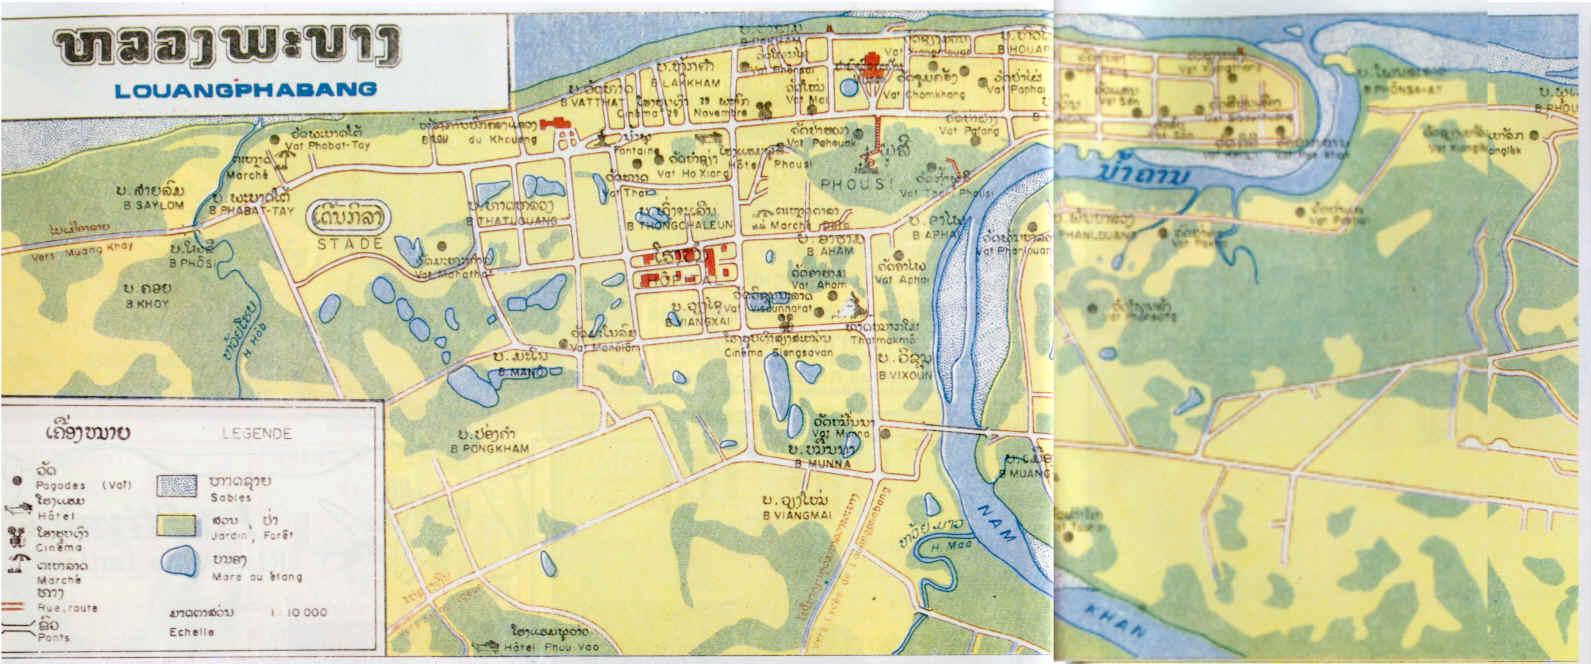 Louangphrabang Tourist Map Louangphrabang mappery